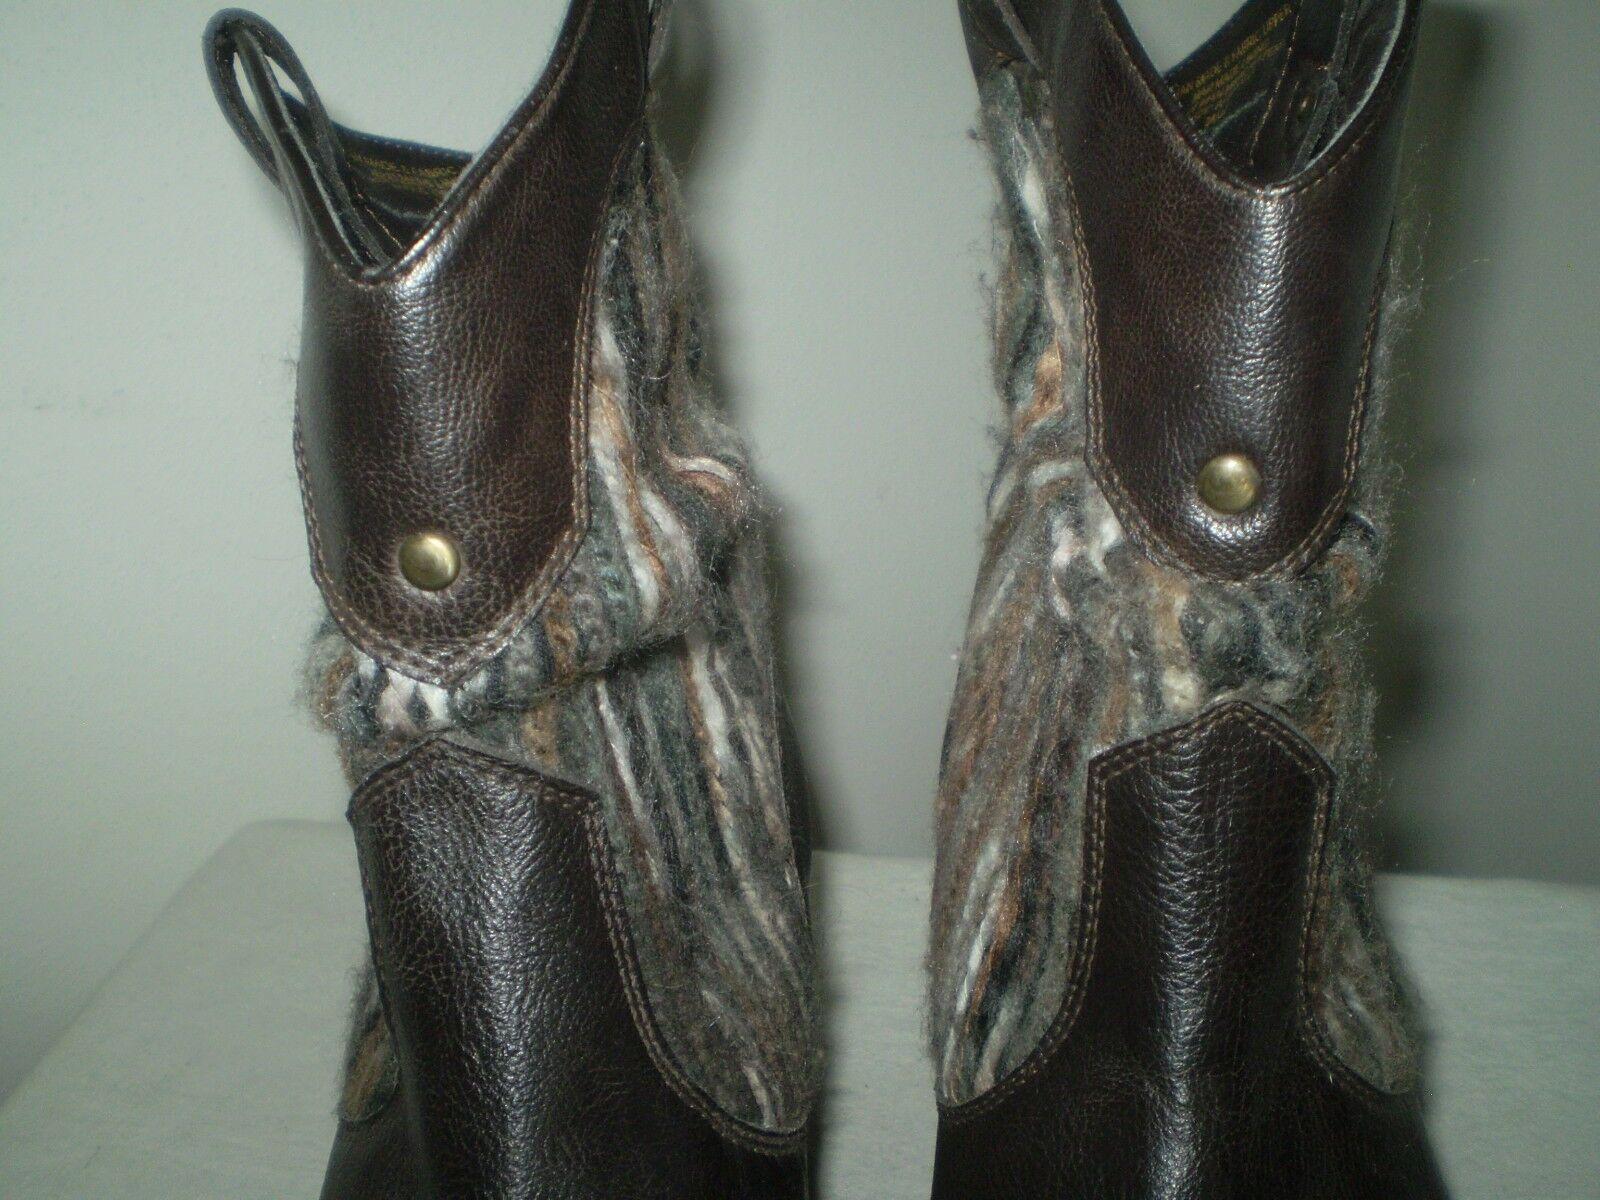 Boc Boc Boc Born braun Western Distress Heels Rustic Accent Shaft Pull On Low Stiefel 8 39 26ee51